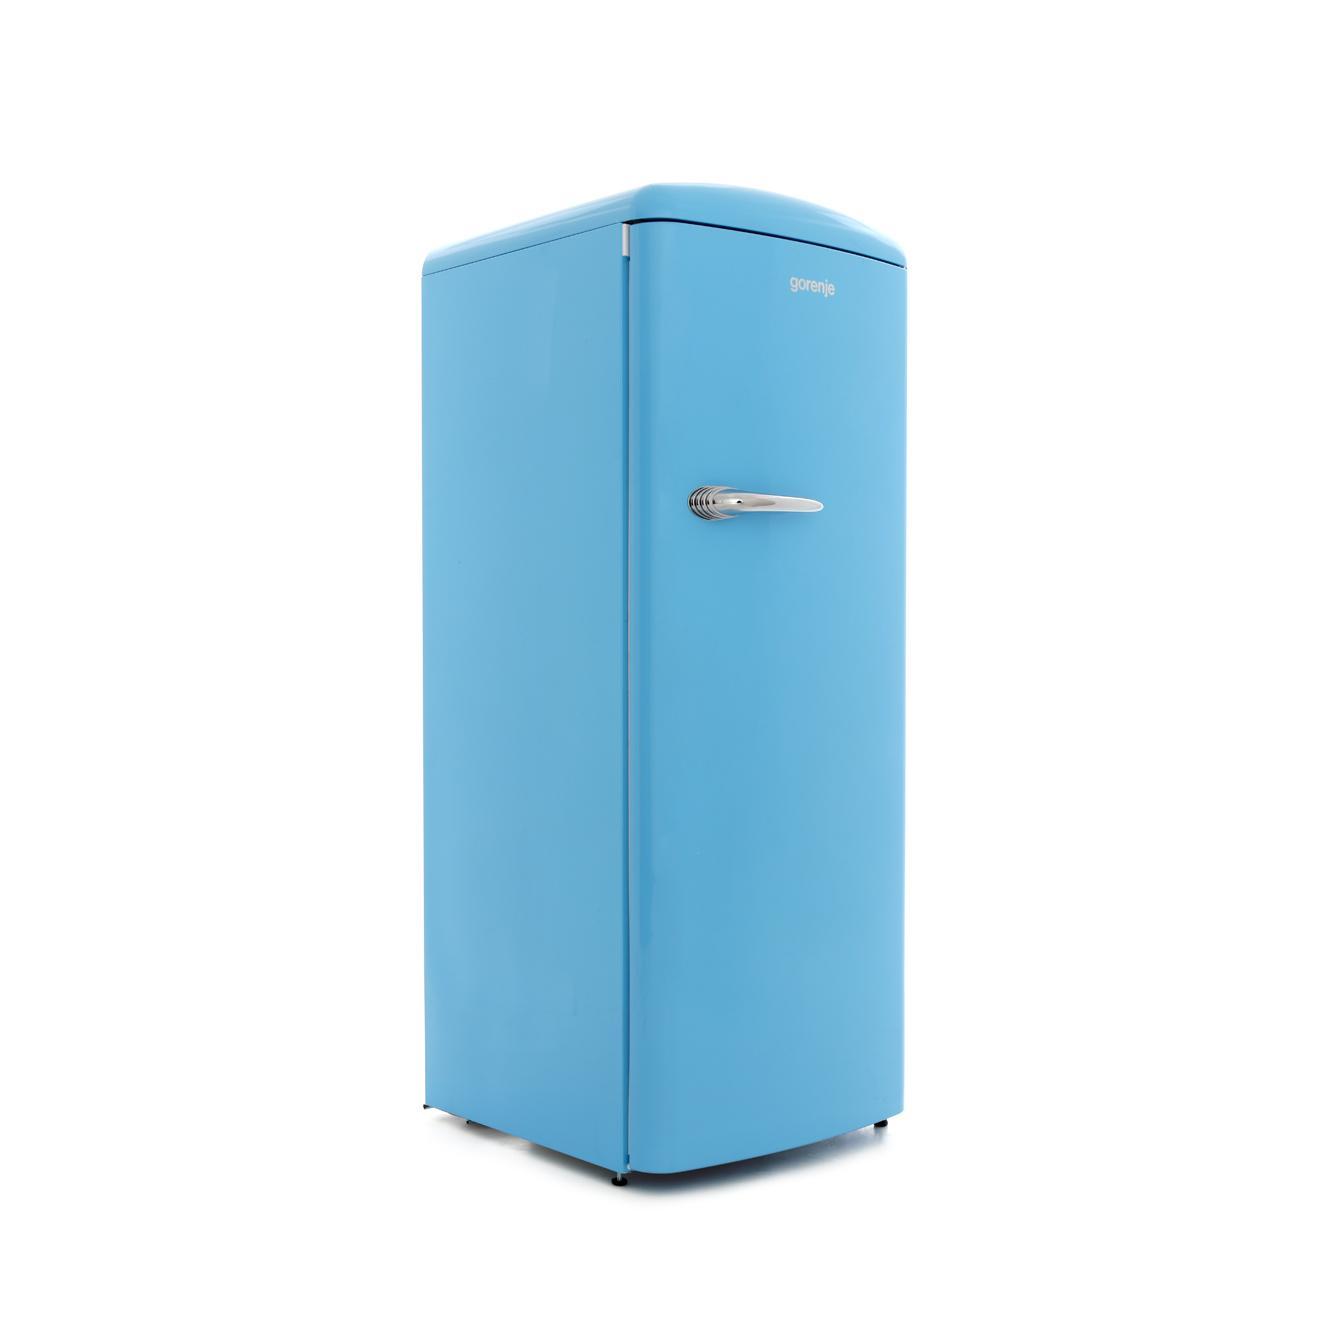 Gorenje ORB153BL Retro Tall Fridge with Ice Box